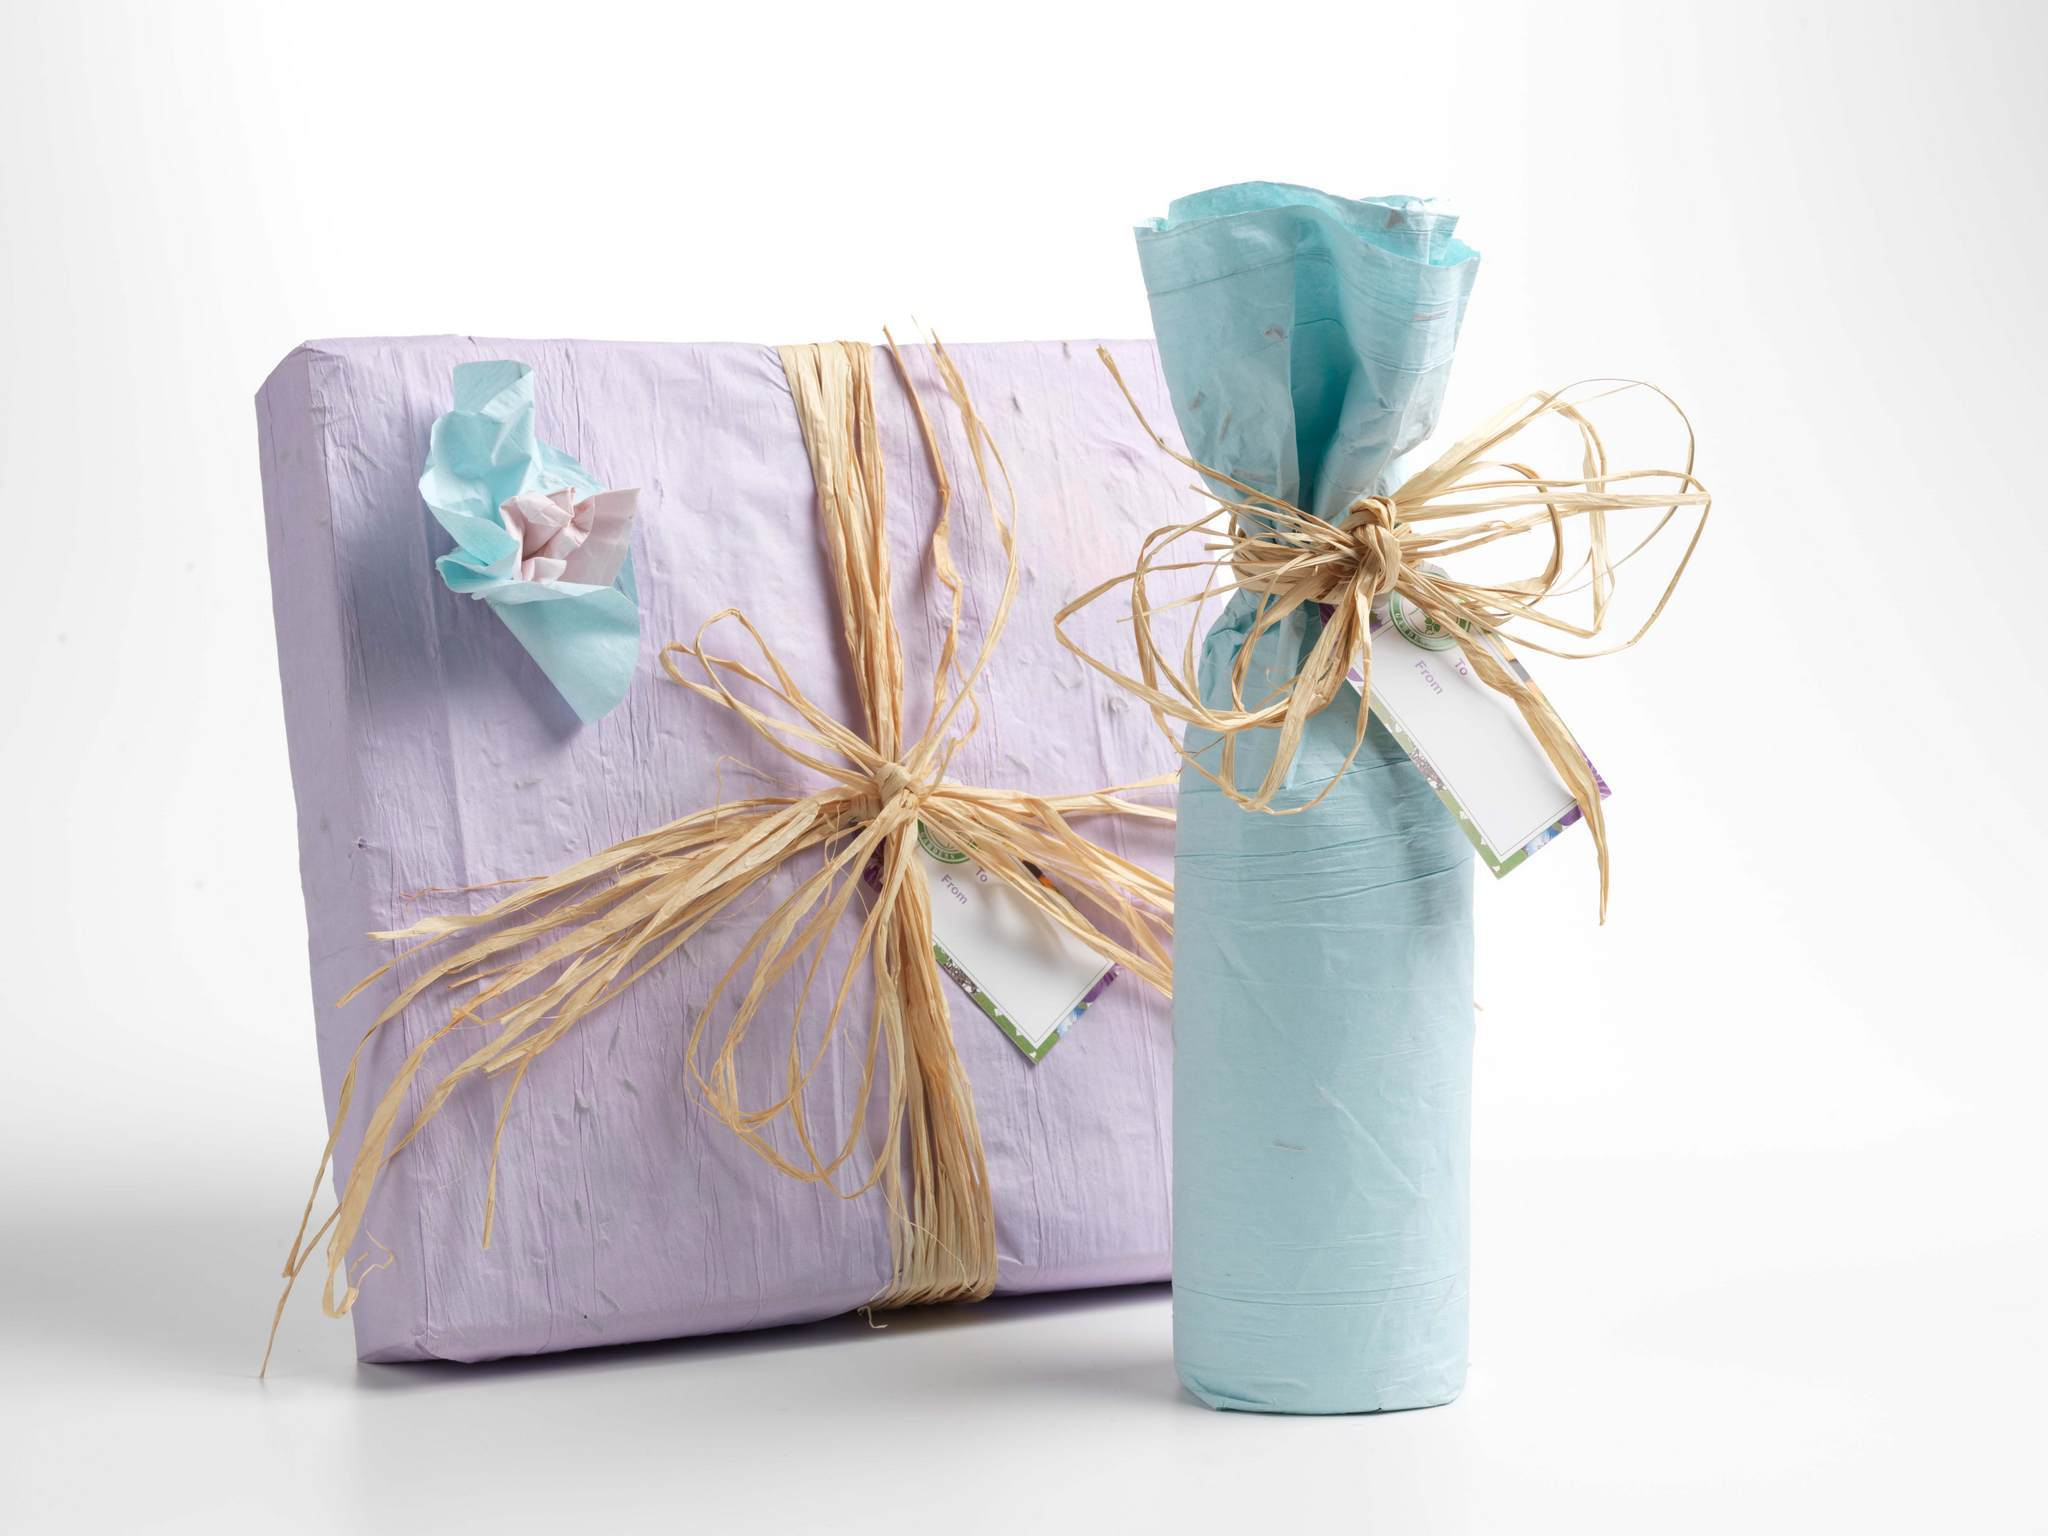 Упаковка подарка в домашних условиях